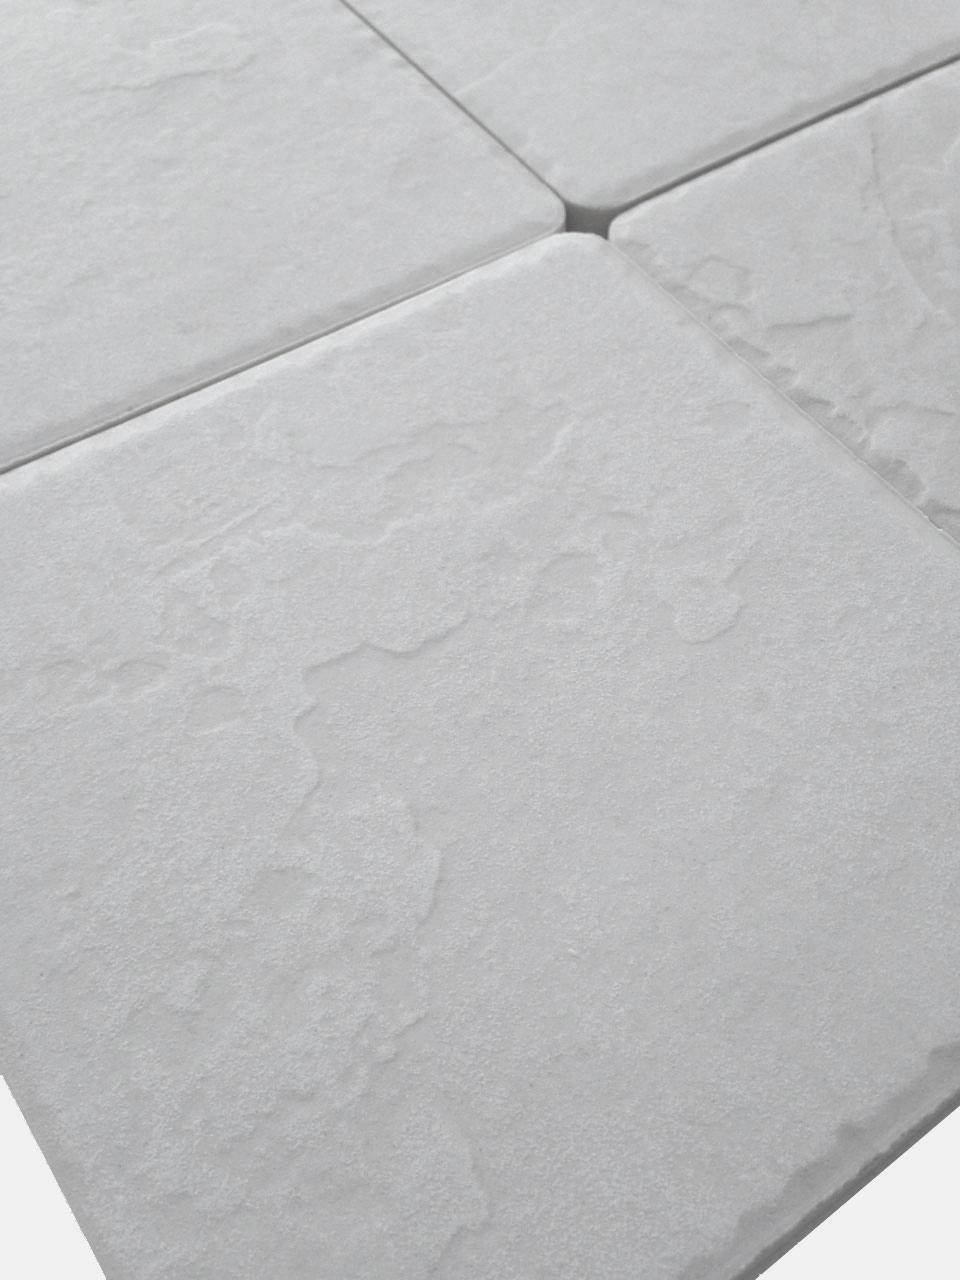 Piastrelle pavimento esterno gres porcellanato antiscivolo 15x15 bianco himalaya ebay - Piastrelle pavimento esterno ...